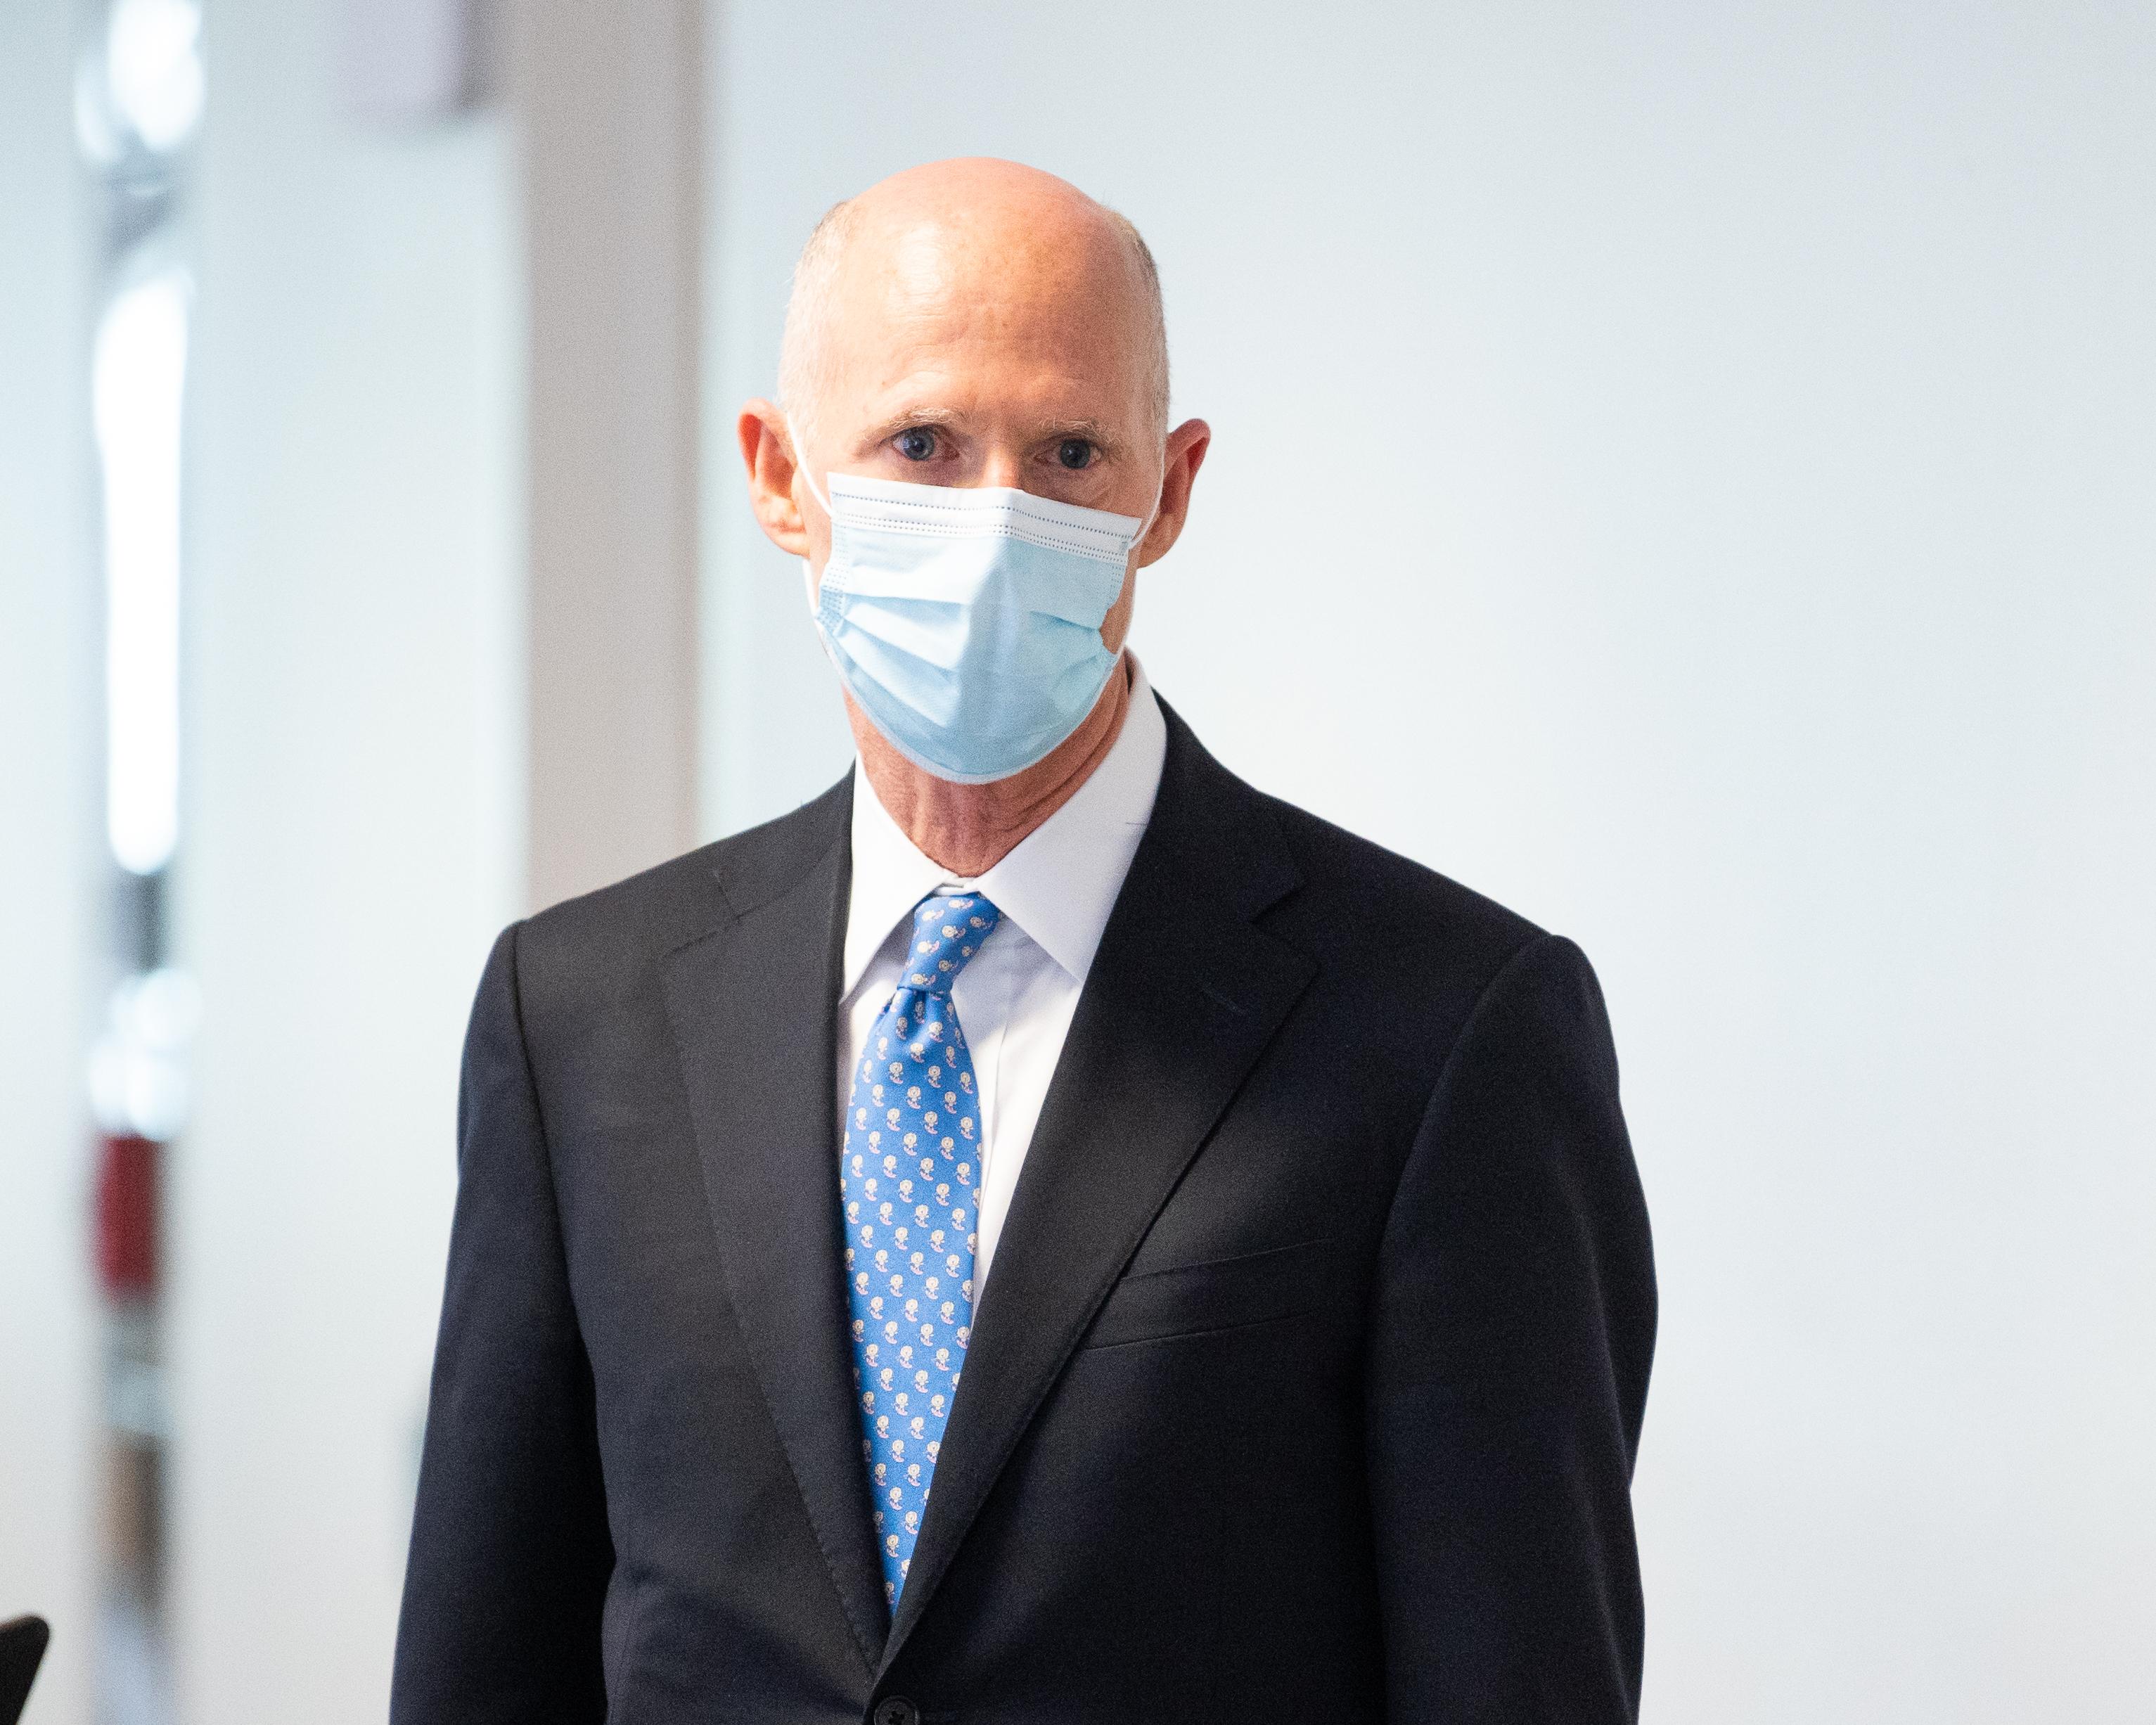 WASHINGTON, UNITED STATES - MAY 05, 2020: U.S. Senator, Rick Scott (R-FL) wearing a face mask as a precaution against covid 19.